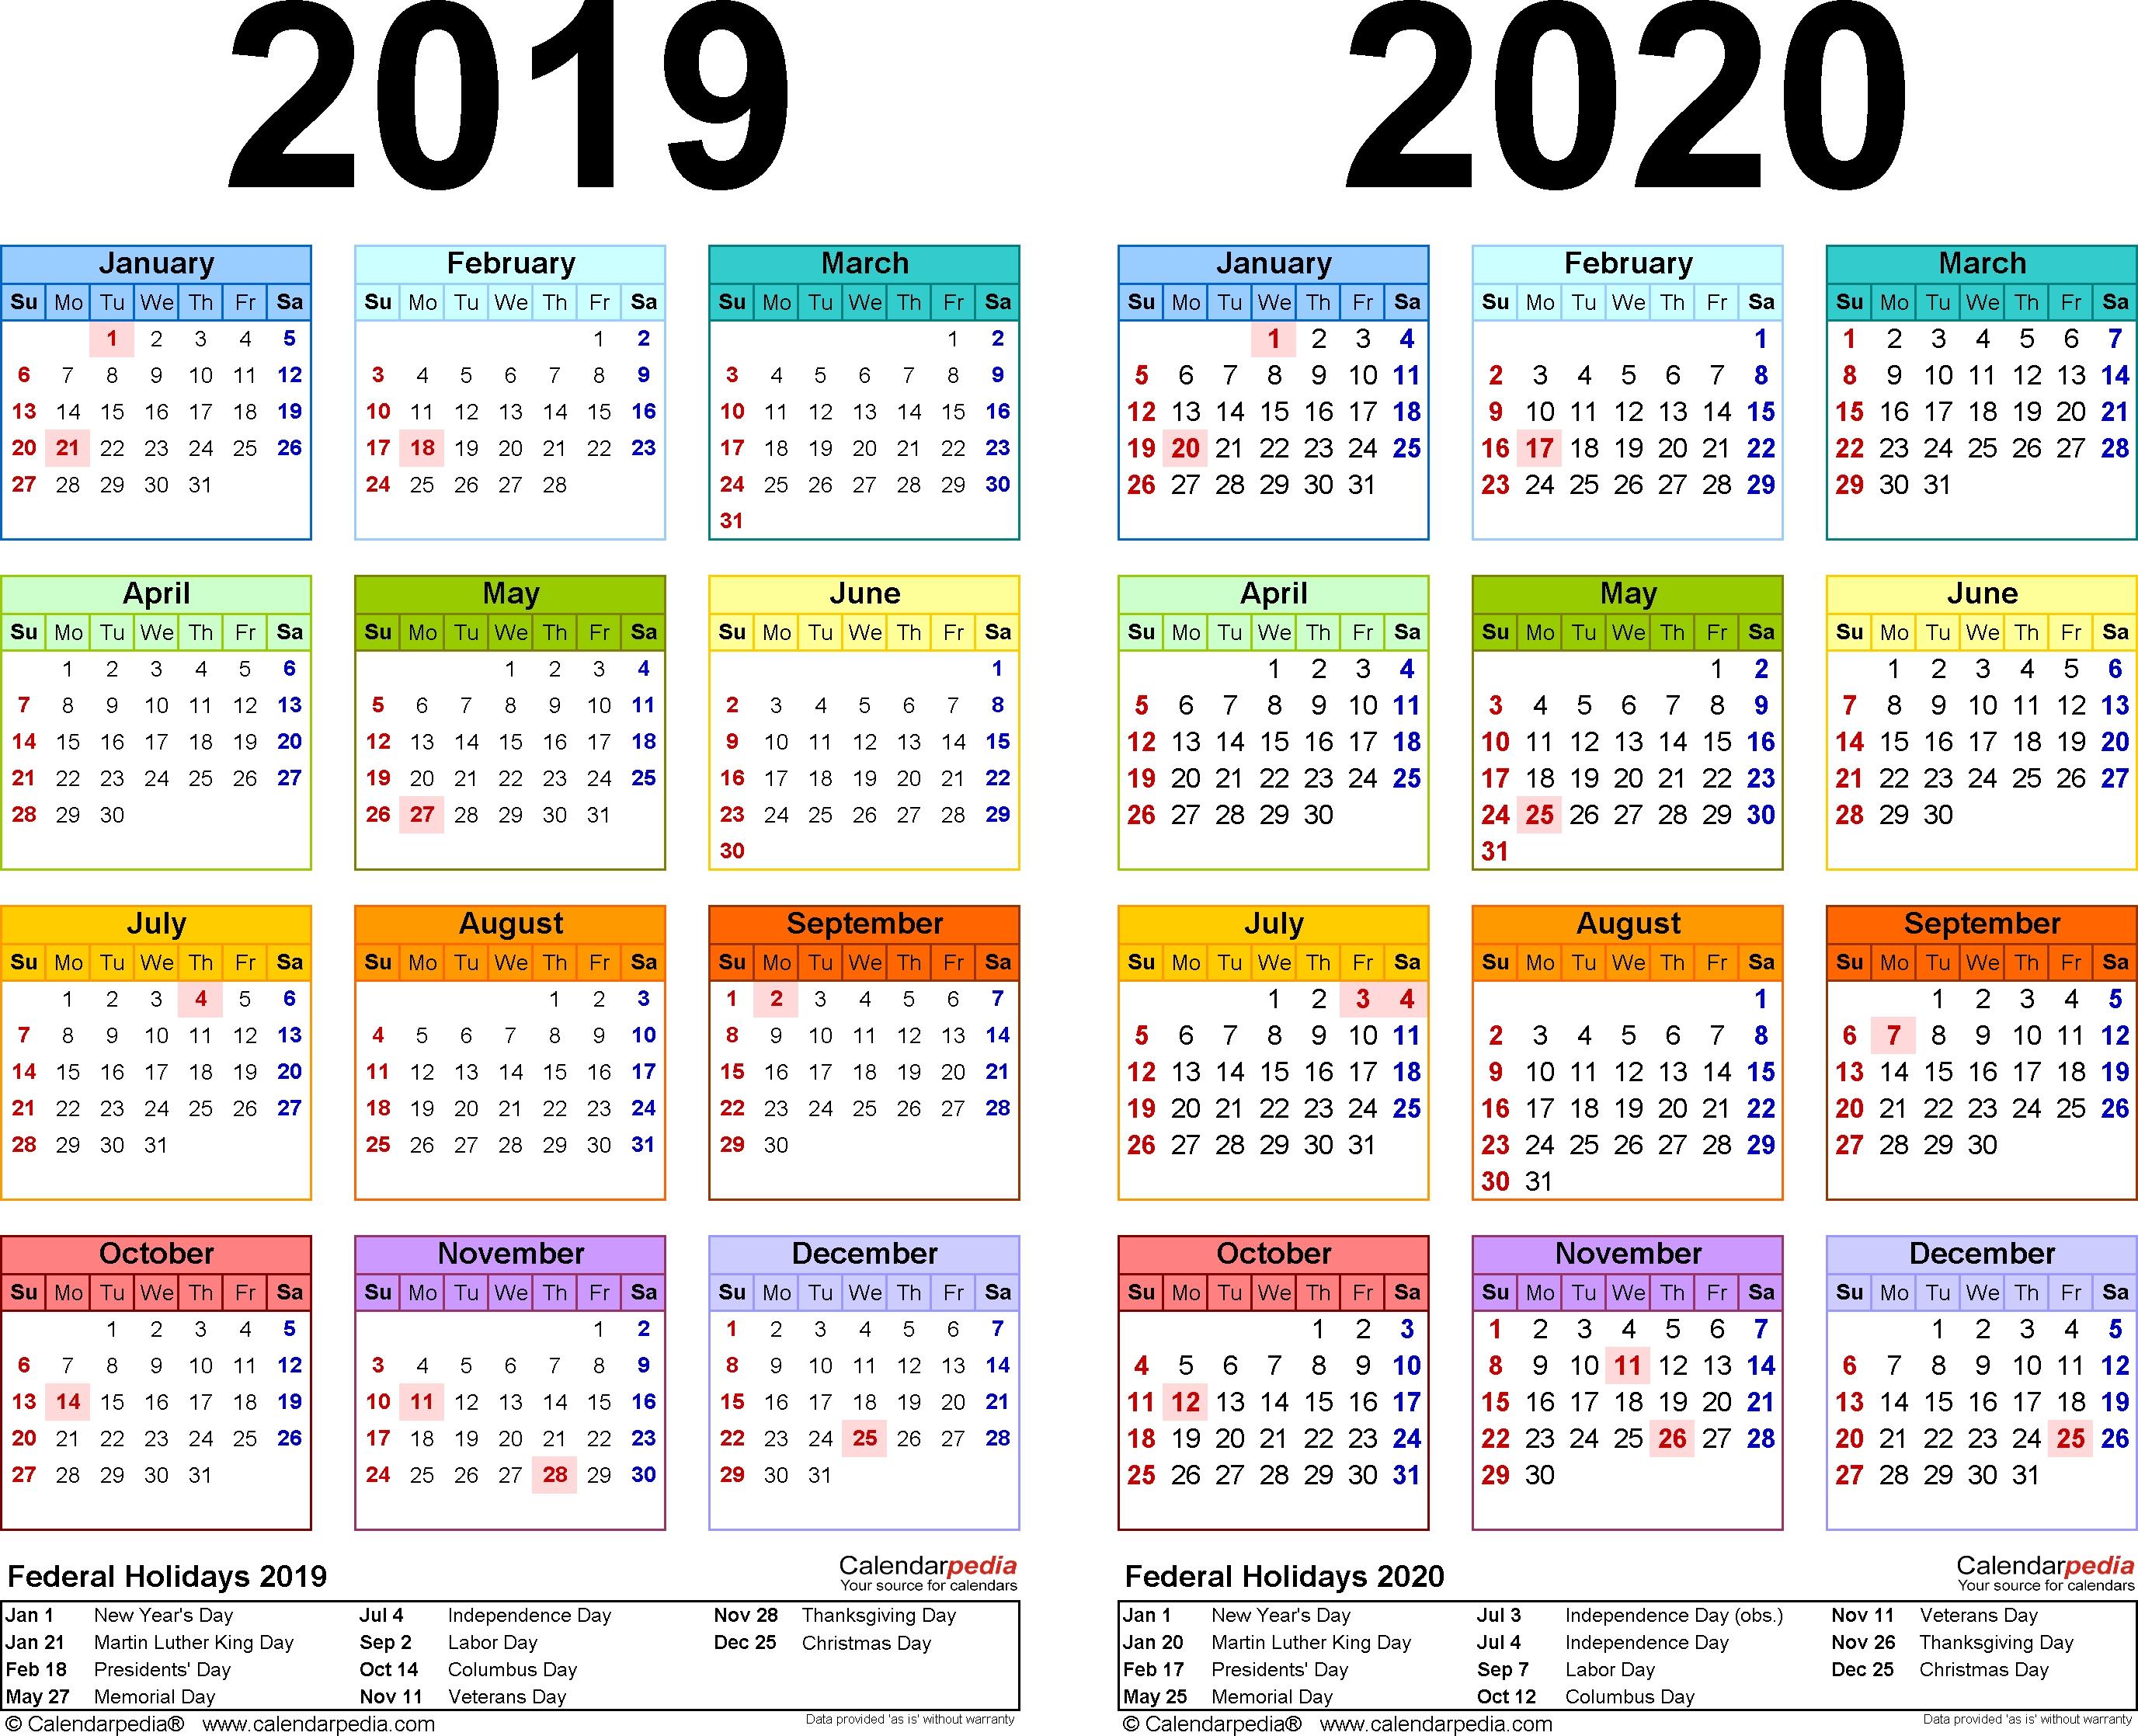 2019-2020 Calendar - Free Printable Two-Year Pdf Calendars throughout June 2019 To May 2020 Calendar